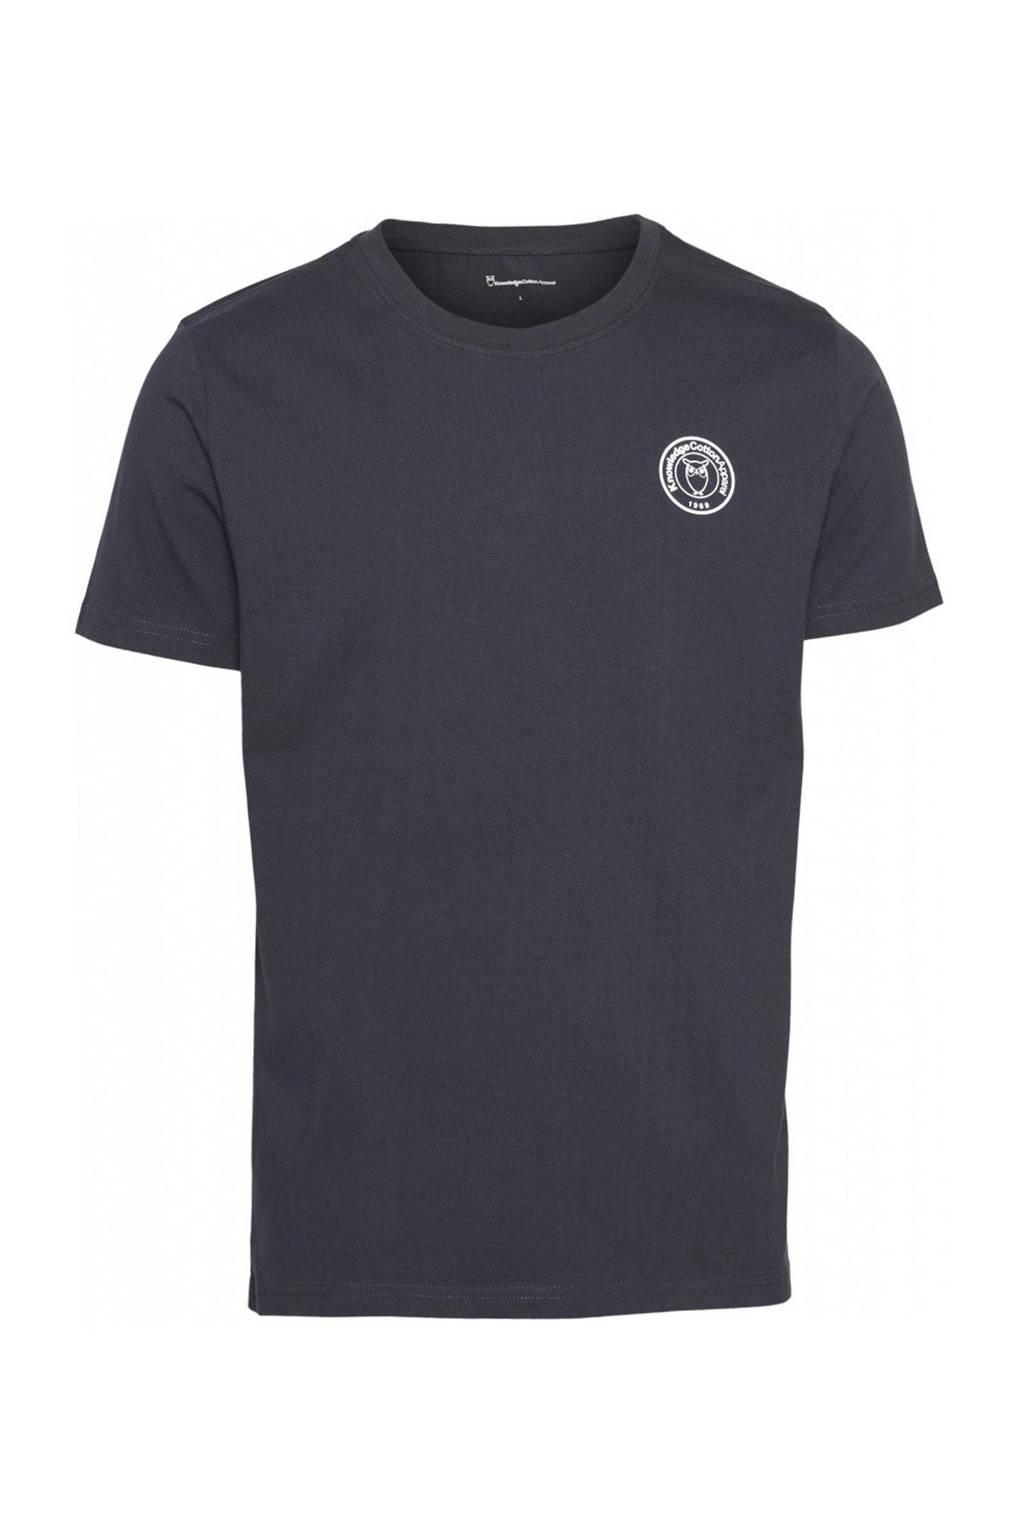 Knowledge Cotton Apparel T-shirt met printopdruk antraciet, Antraciet